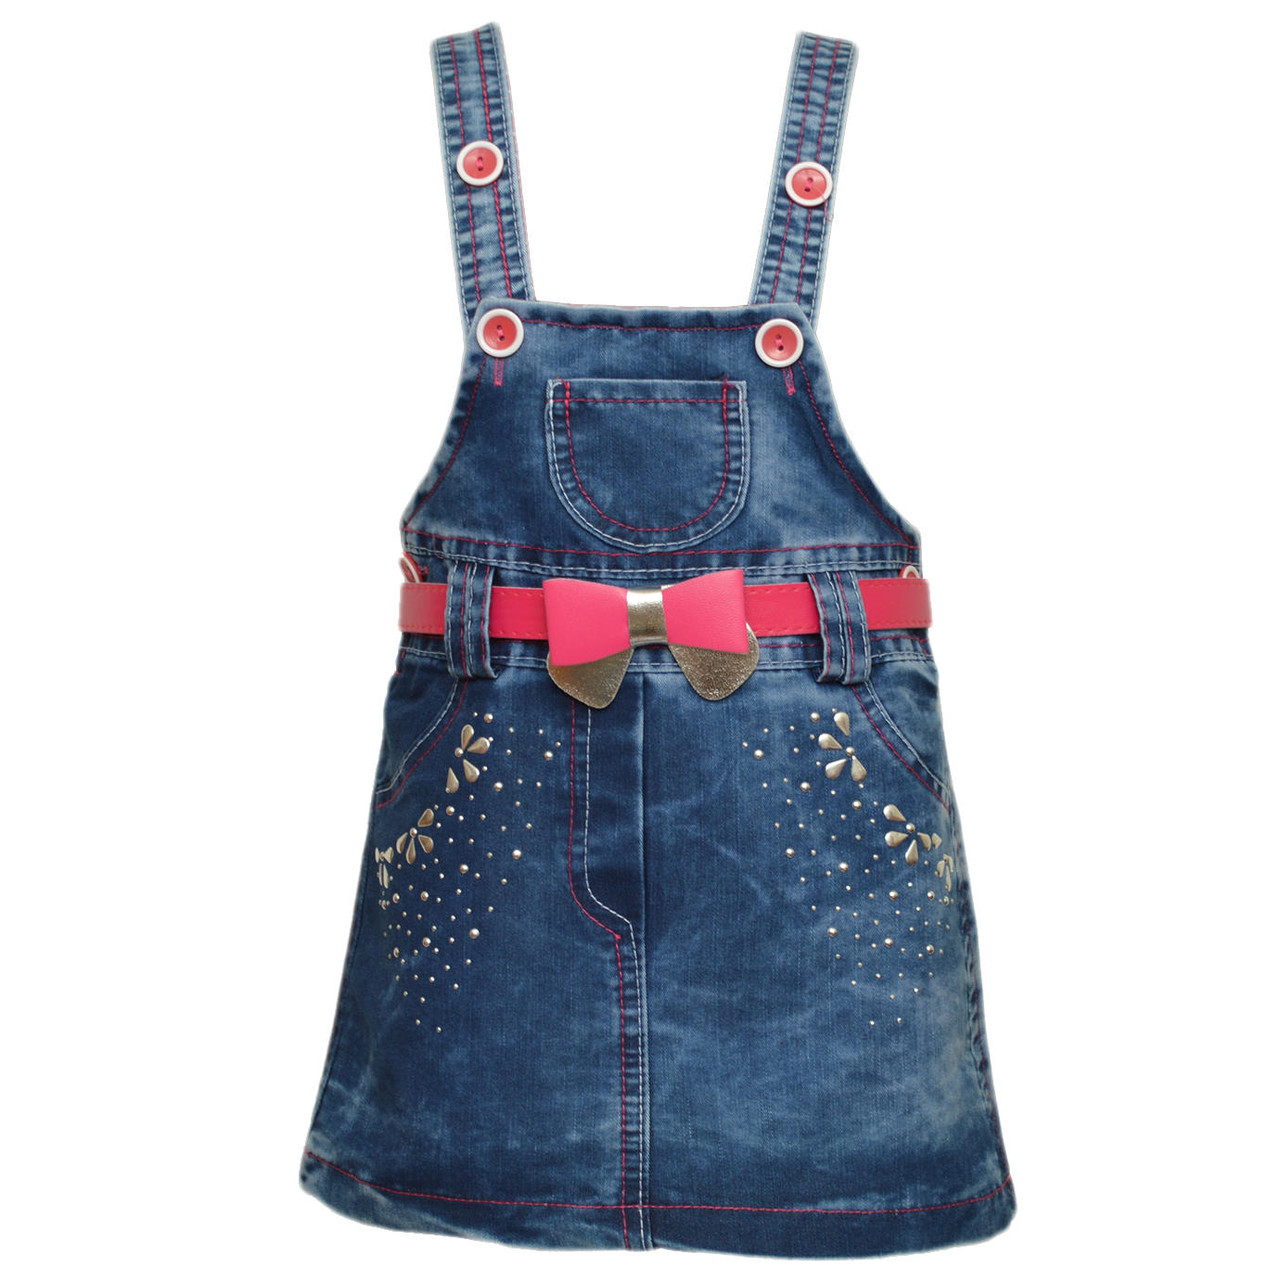 Джинсовая юбка на бретелях, на 1,2 годика, Турция, фото 1